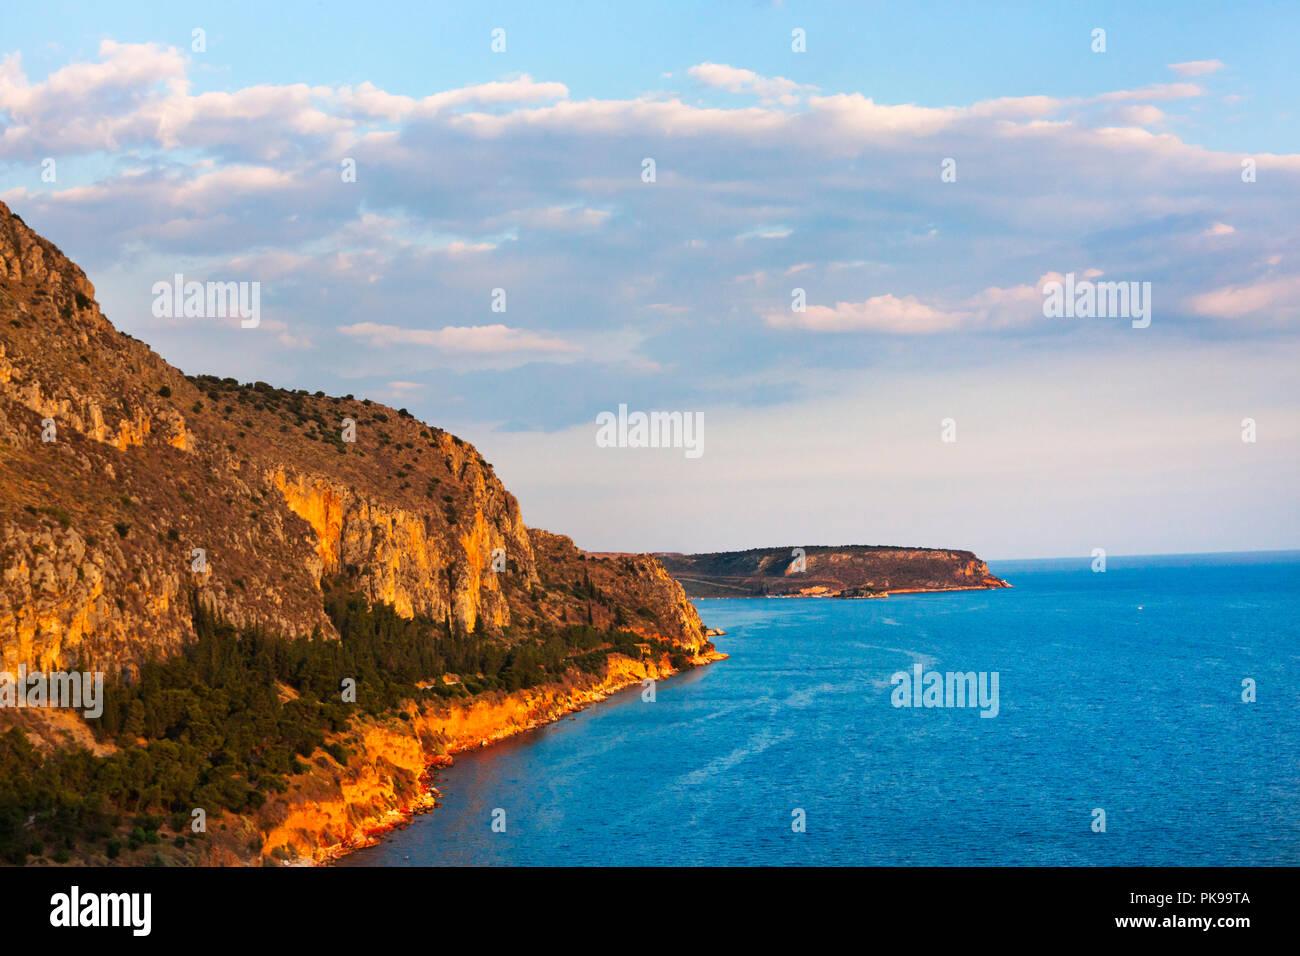 Palamidi Castle by Aegean Sea, Nafplio, Greece - Stock Image